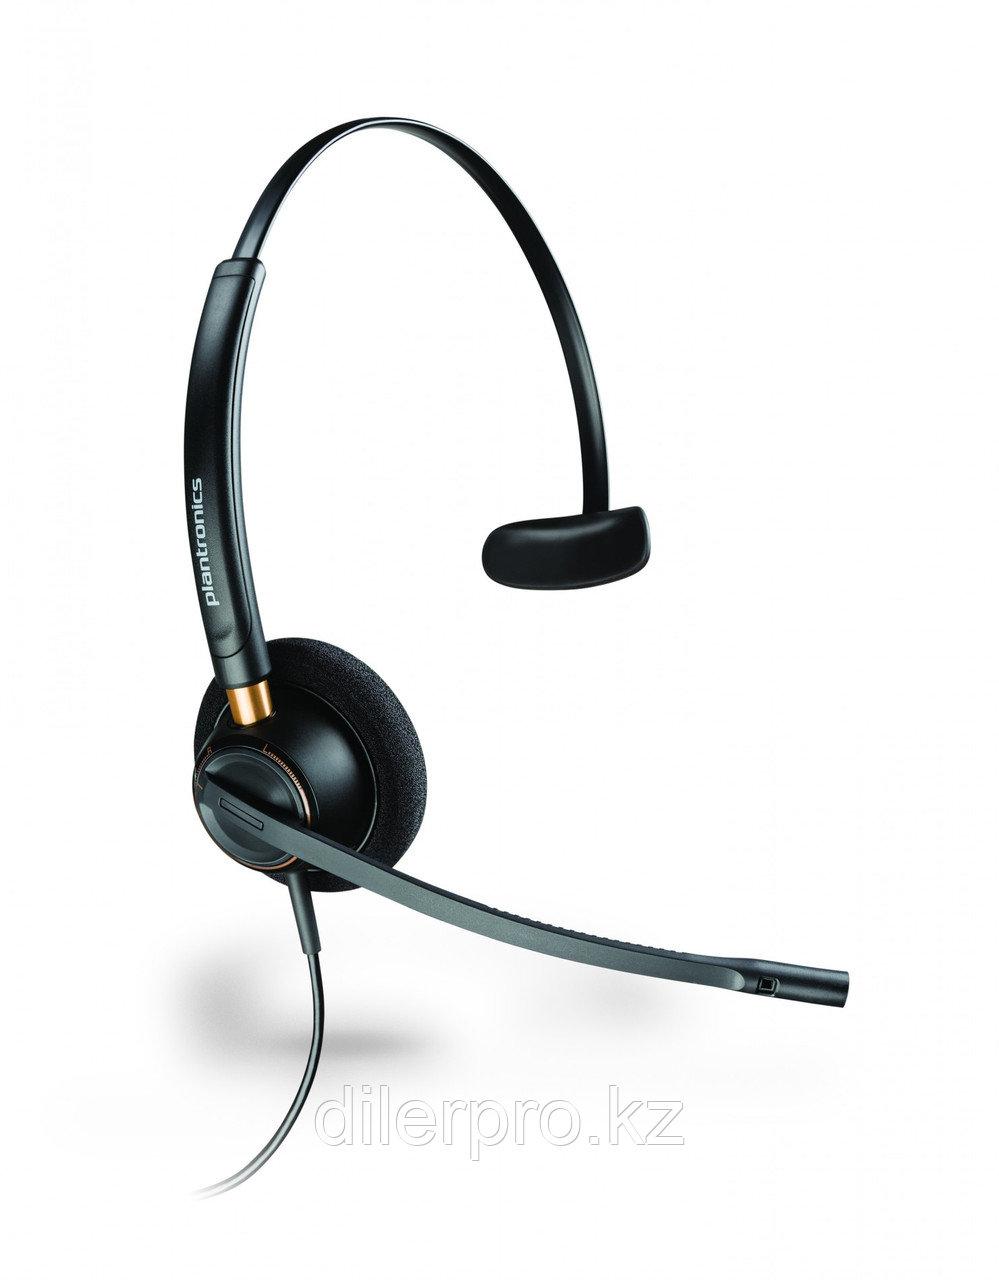 Plantronics EncorePro HW510 NC Wideband - телефонная гарнитура для оператора call-центра